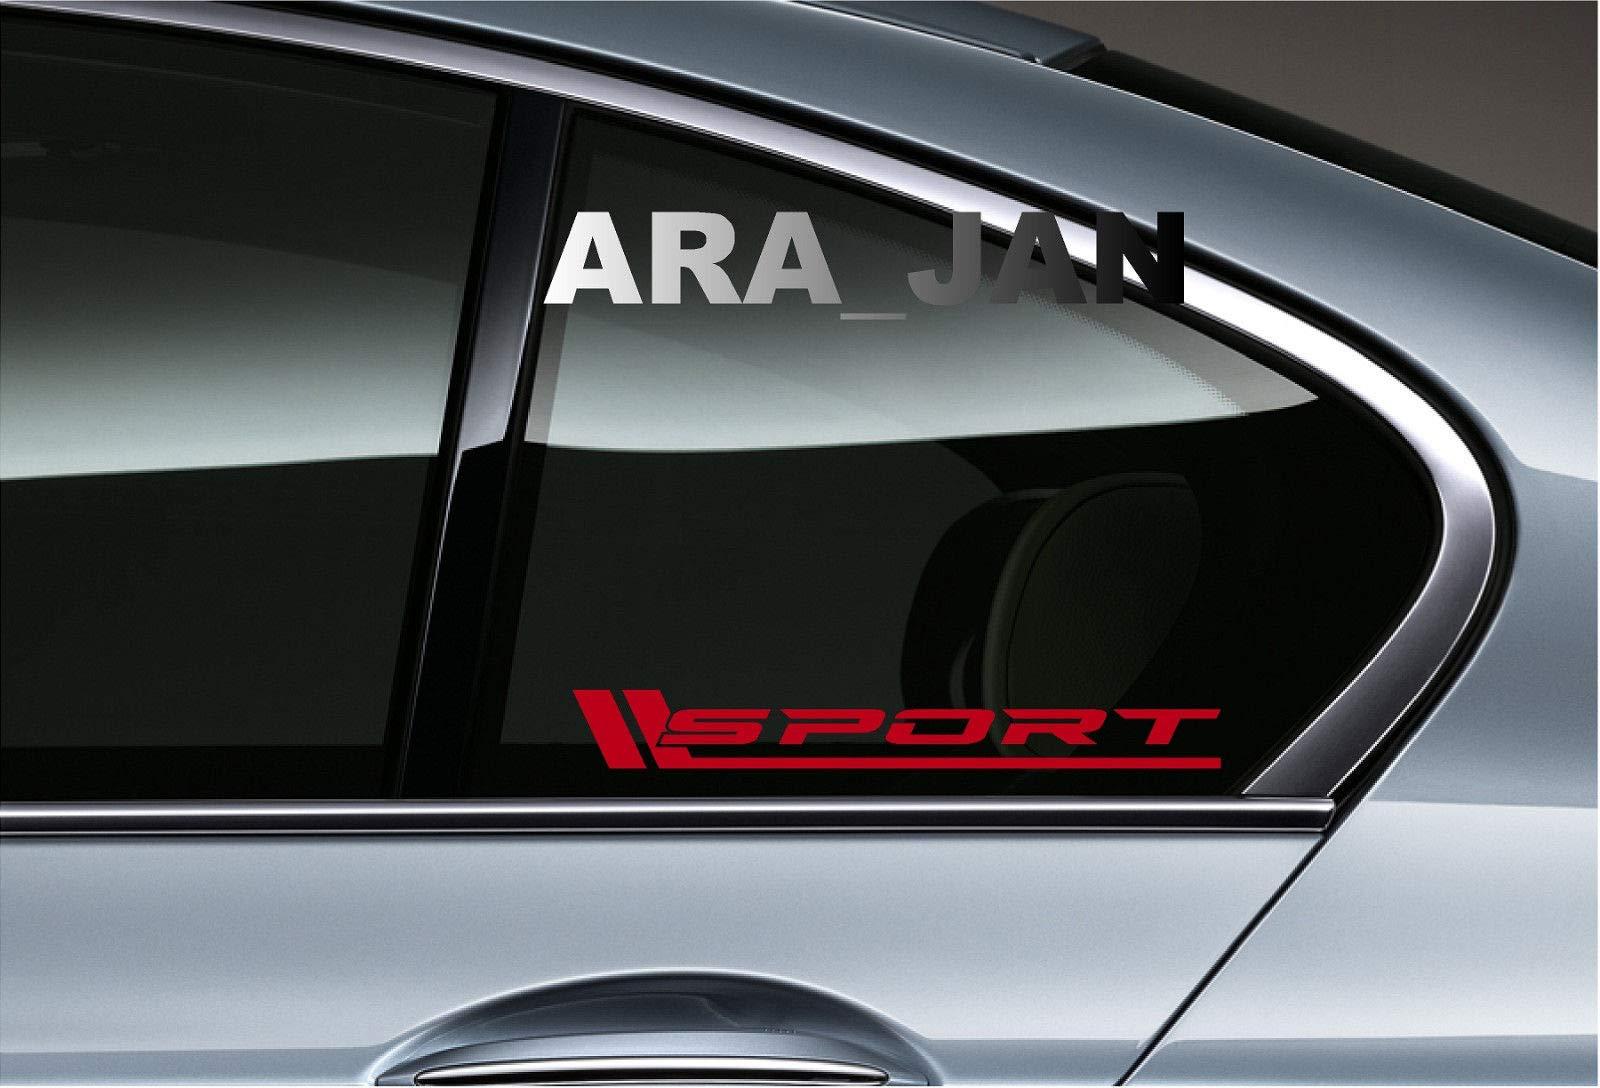 POWERED BY SPORT Vinyl Decal Sticker Emblem logo Racing Motorsport Car Truck